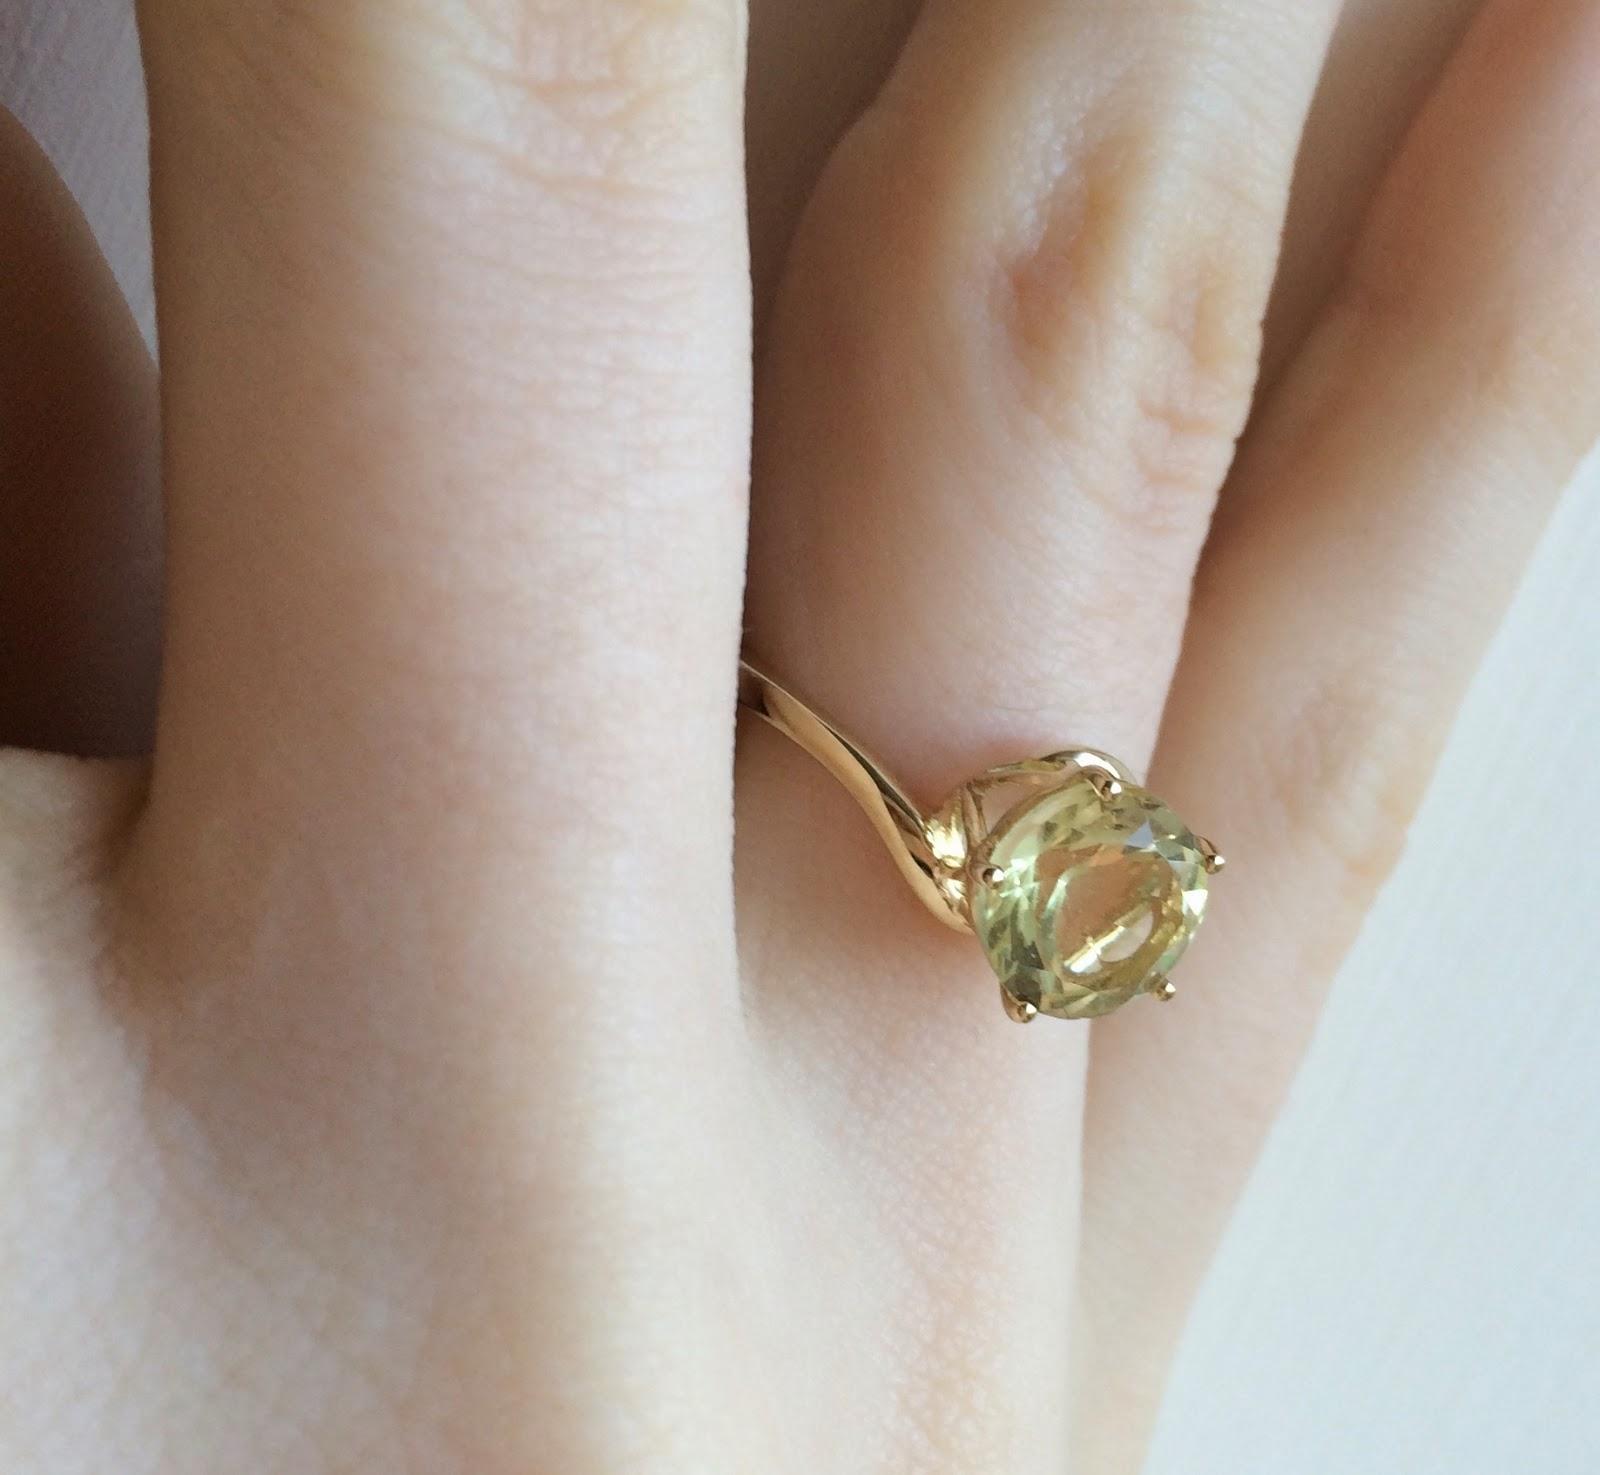 gemporia-yellow-citrine-ring-9k-gold